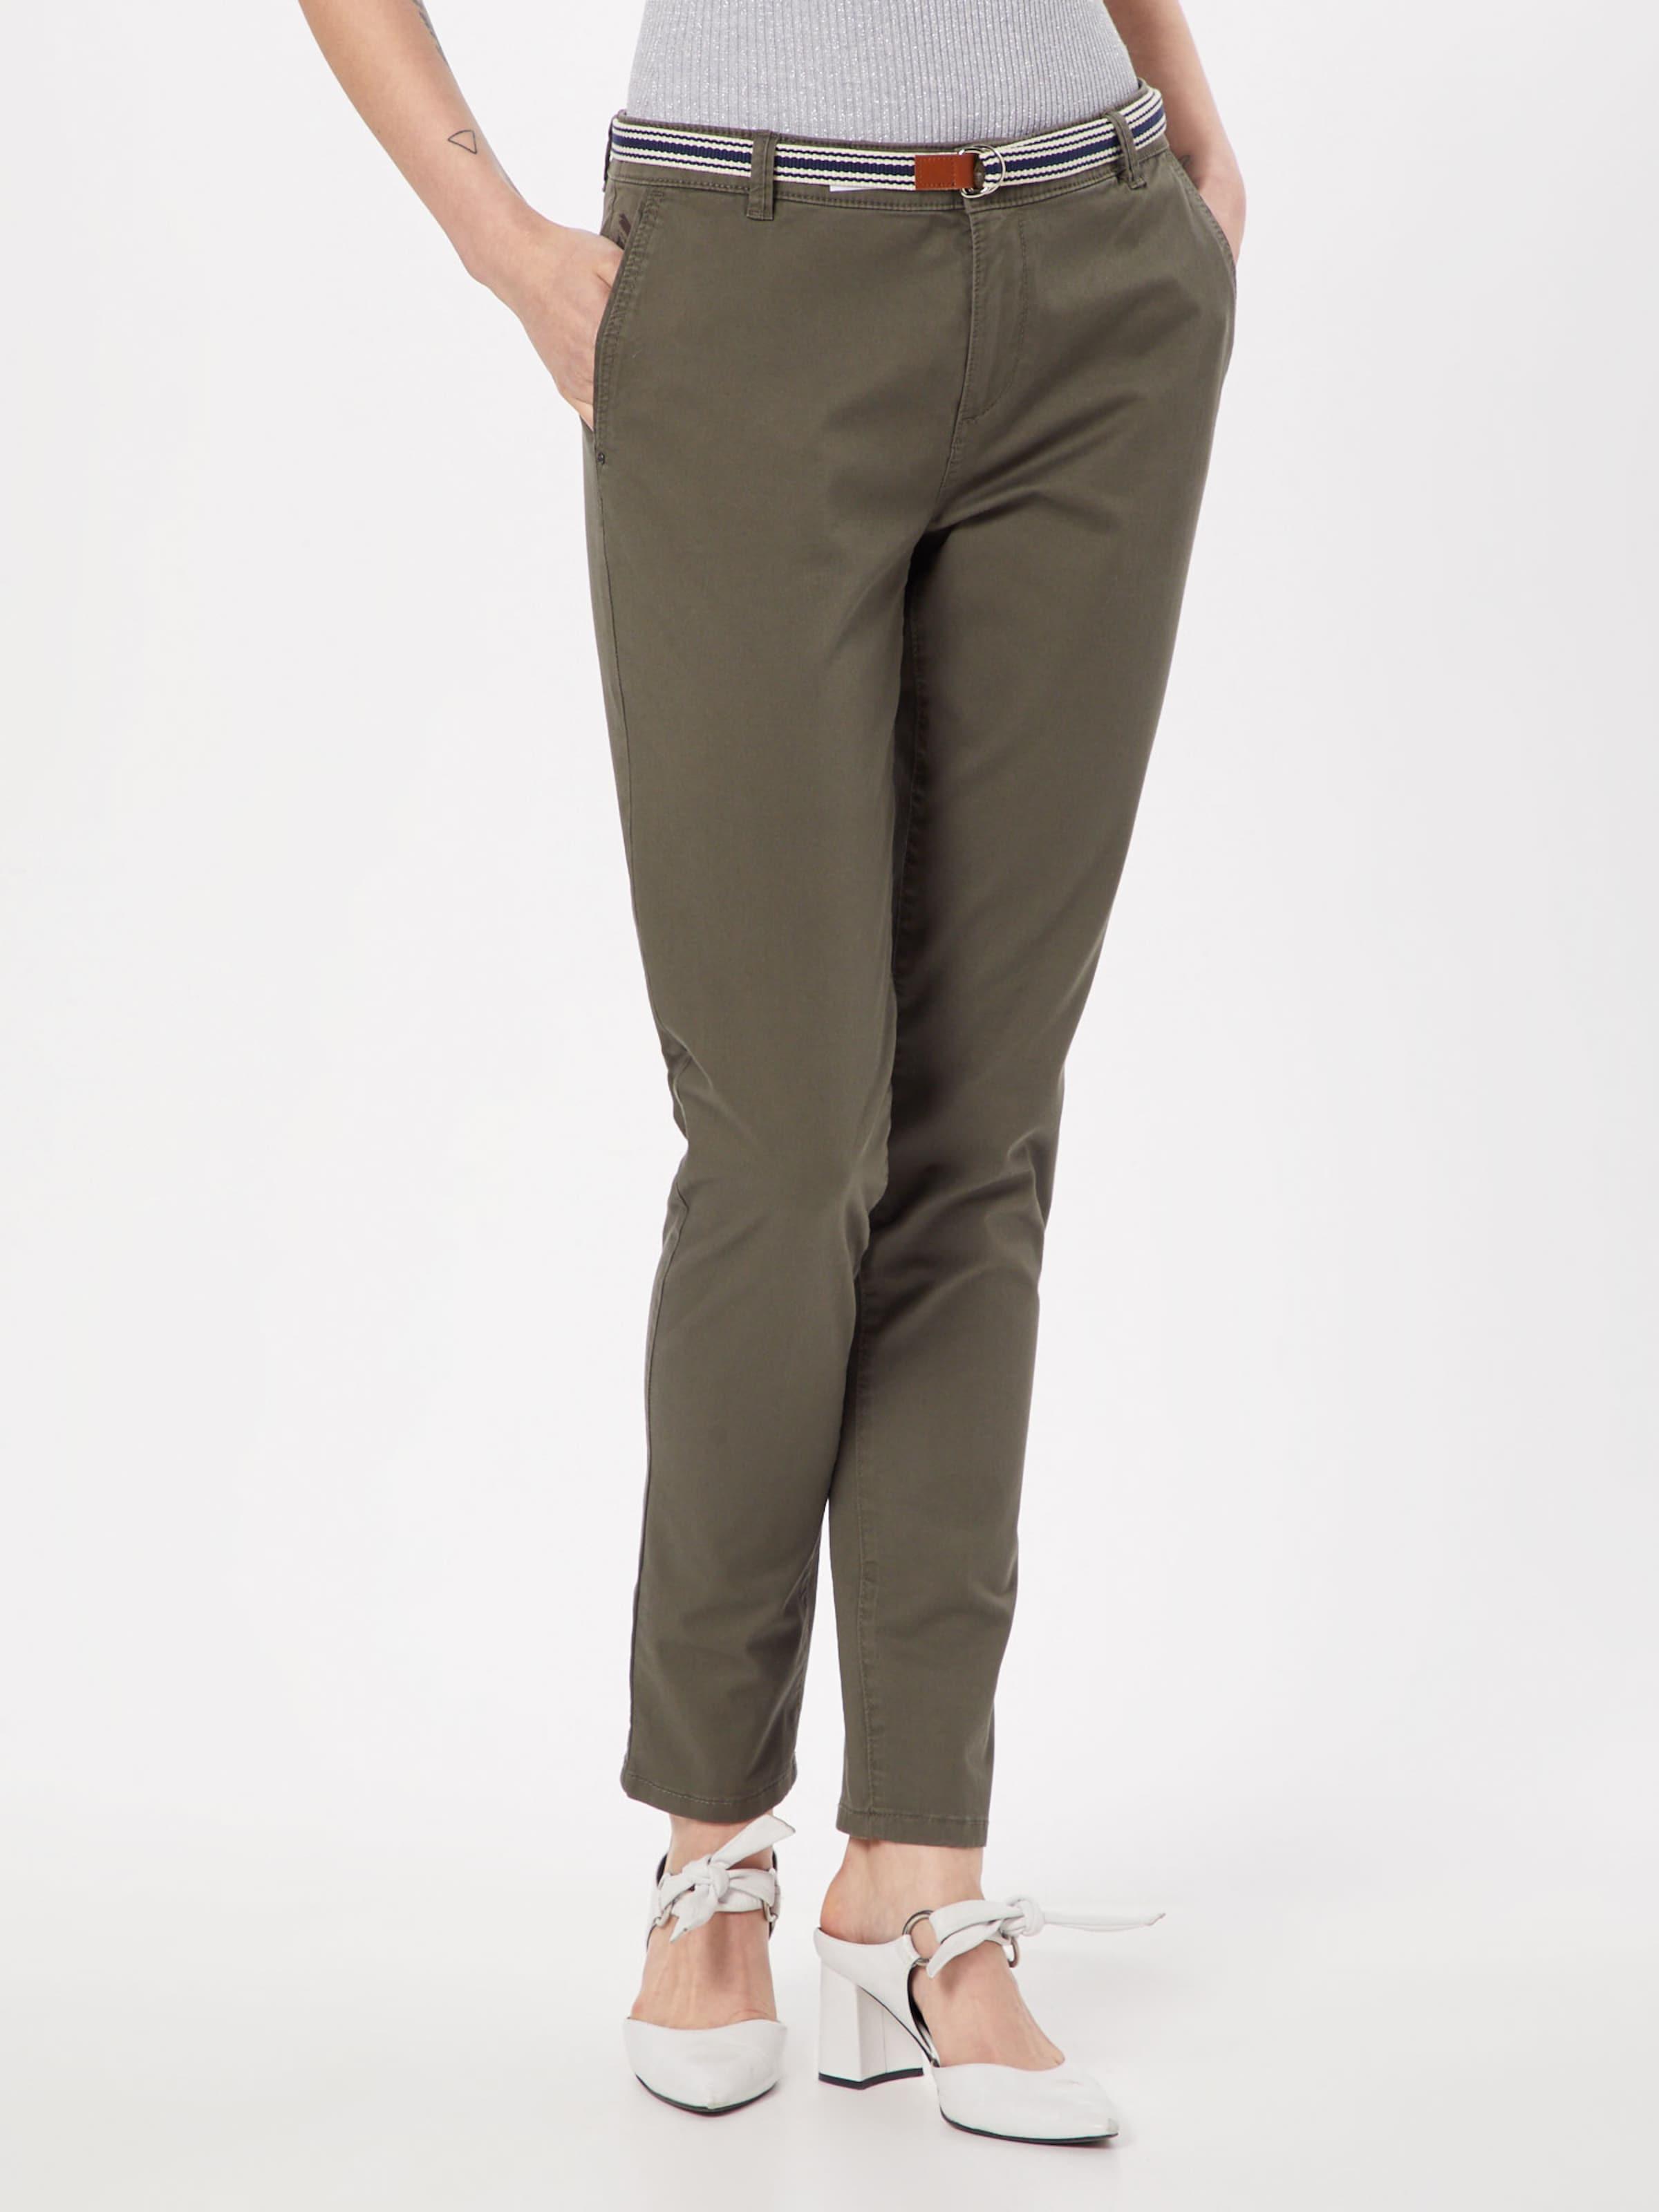 Pantalon En Olive Pantalon Esprit Pantalon Esprit En Olive Esprit Chino Chino vm08nNw